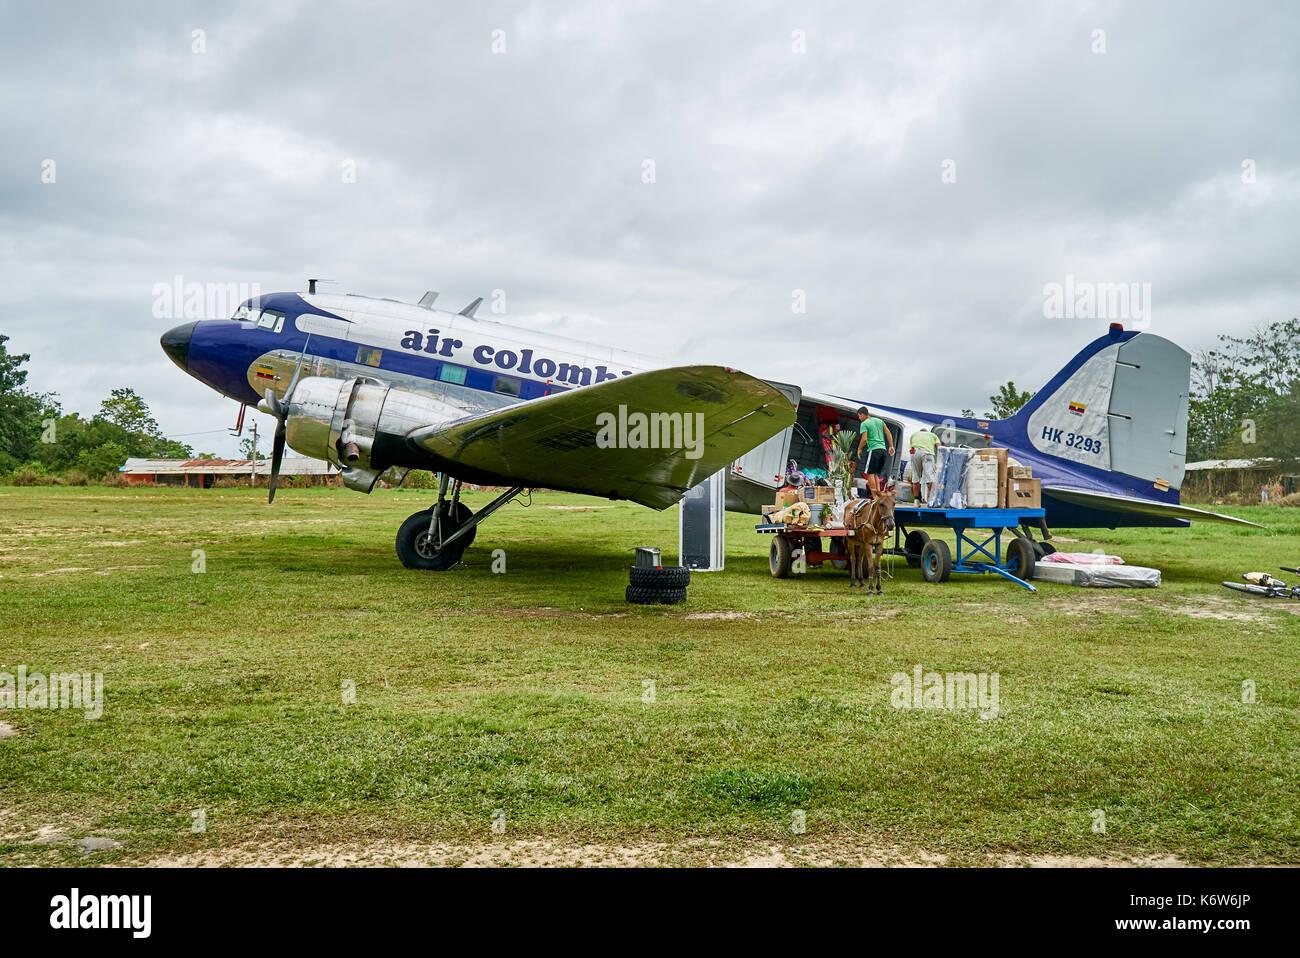 old Douglas DC-3 propeller plane loaded from donkey carriage , Serrania de la Macarena, La Macarena, Colombia, South - Stock Image